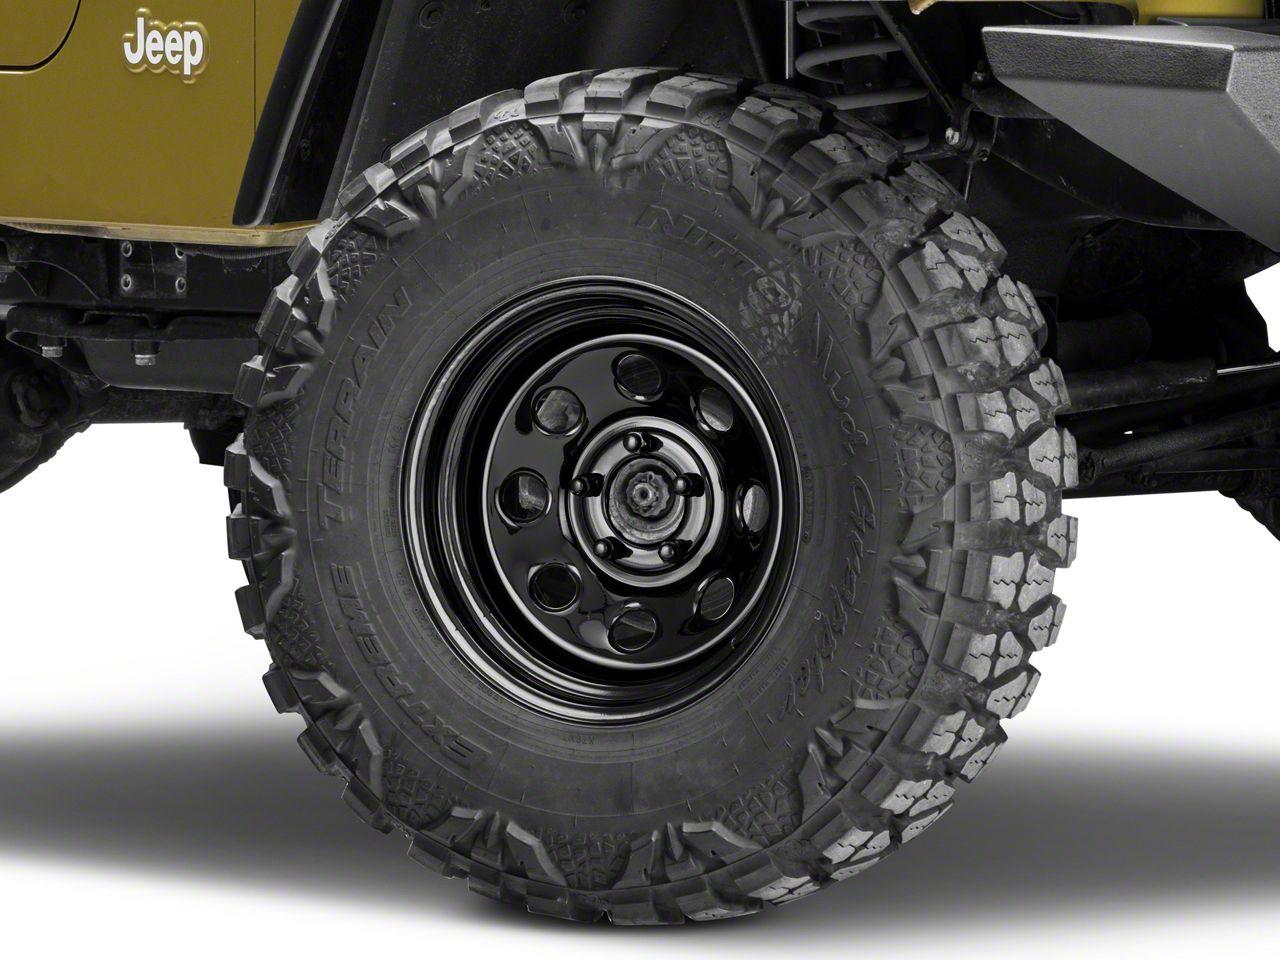 Pro Comp Steel Series 97 Rock Crawler Gloss Black Wheel - 15x8 (87-06 Jeep Wrangler YJ & TJ)